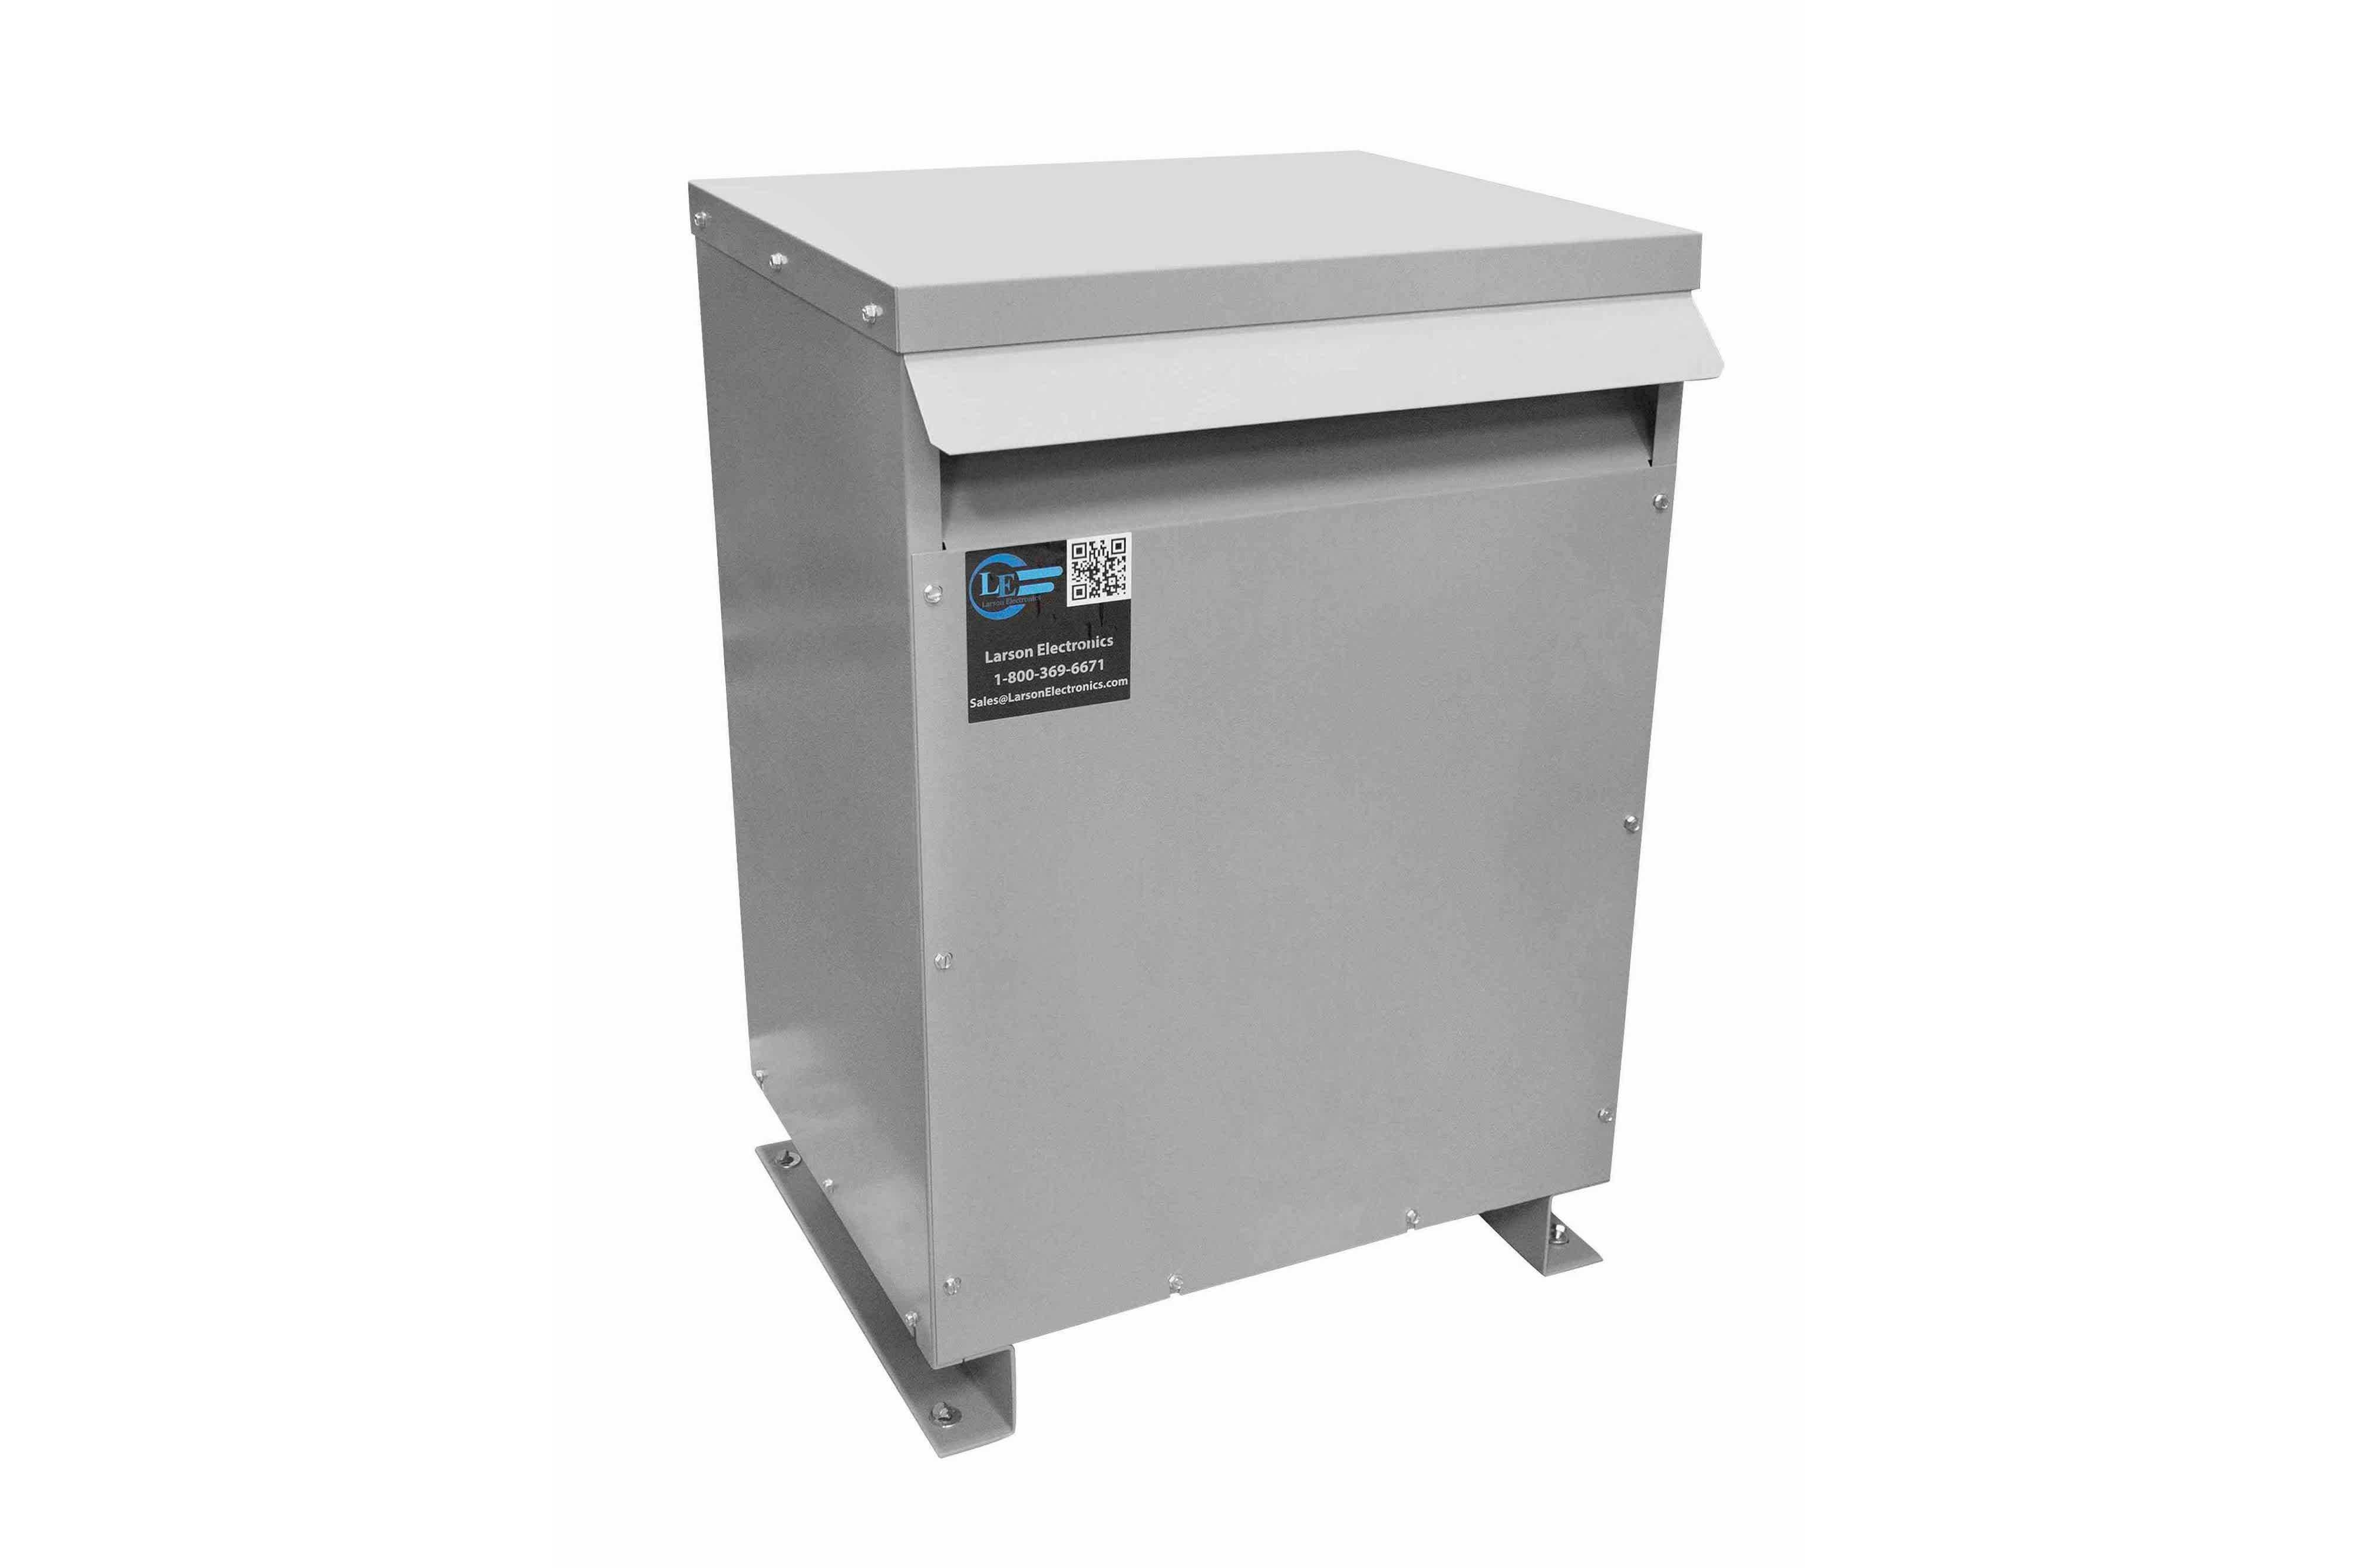 80 kVA 3PH Isolation Transformer, 600V Wye Primary, 380Y/220 Wye-N Secondary, N3R, Ventilated, 60 Hz